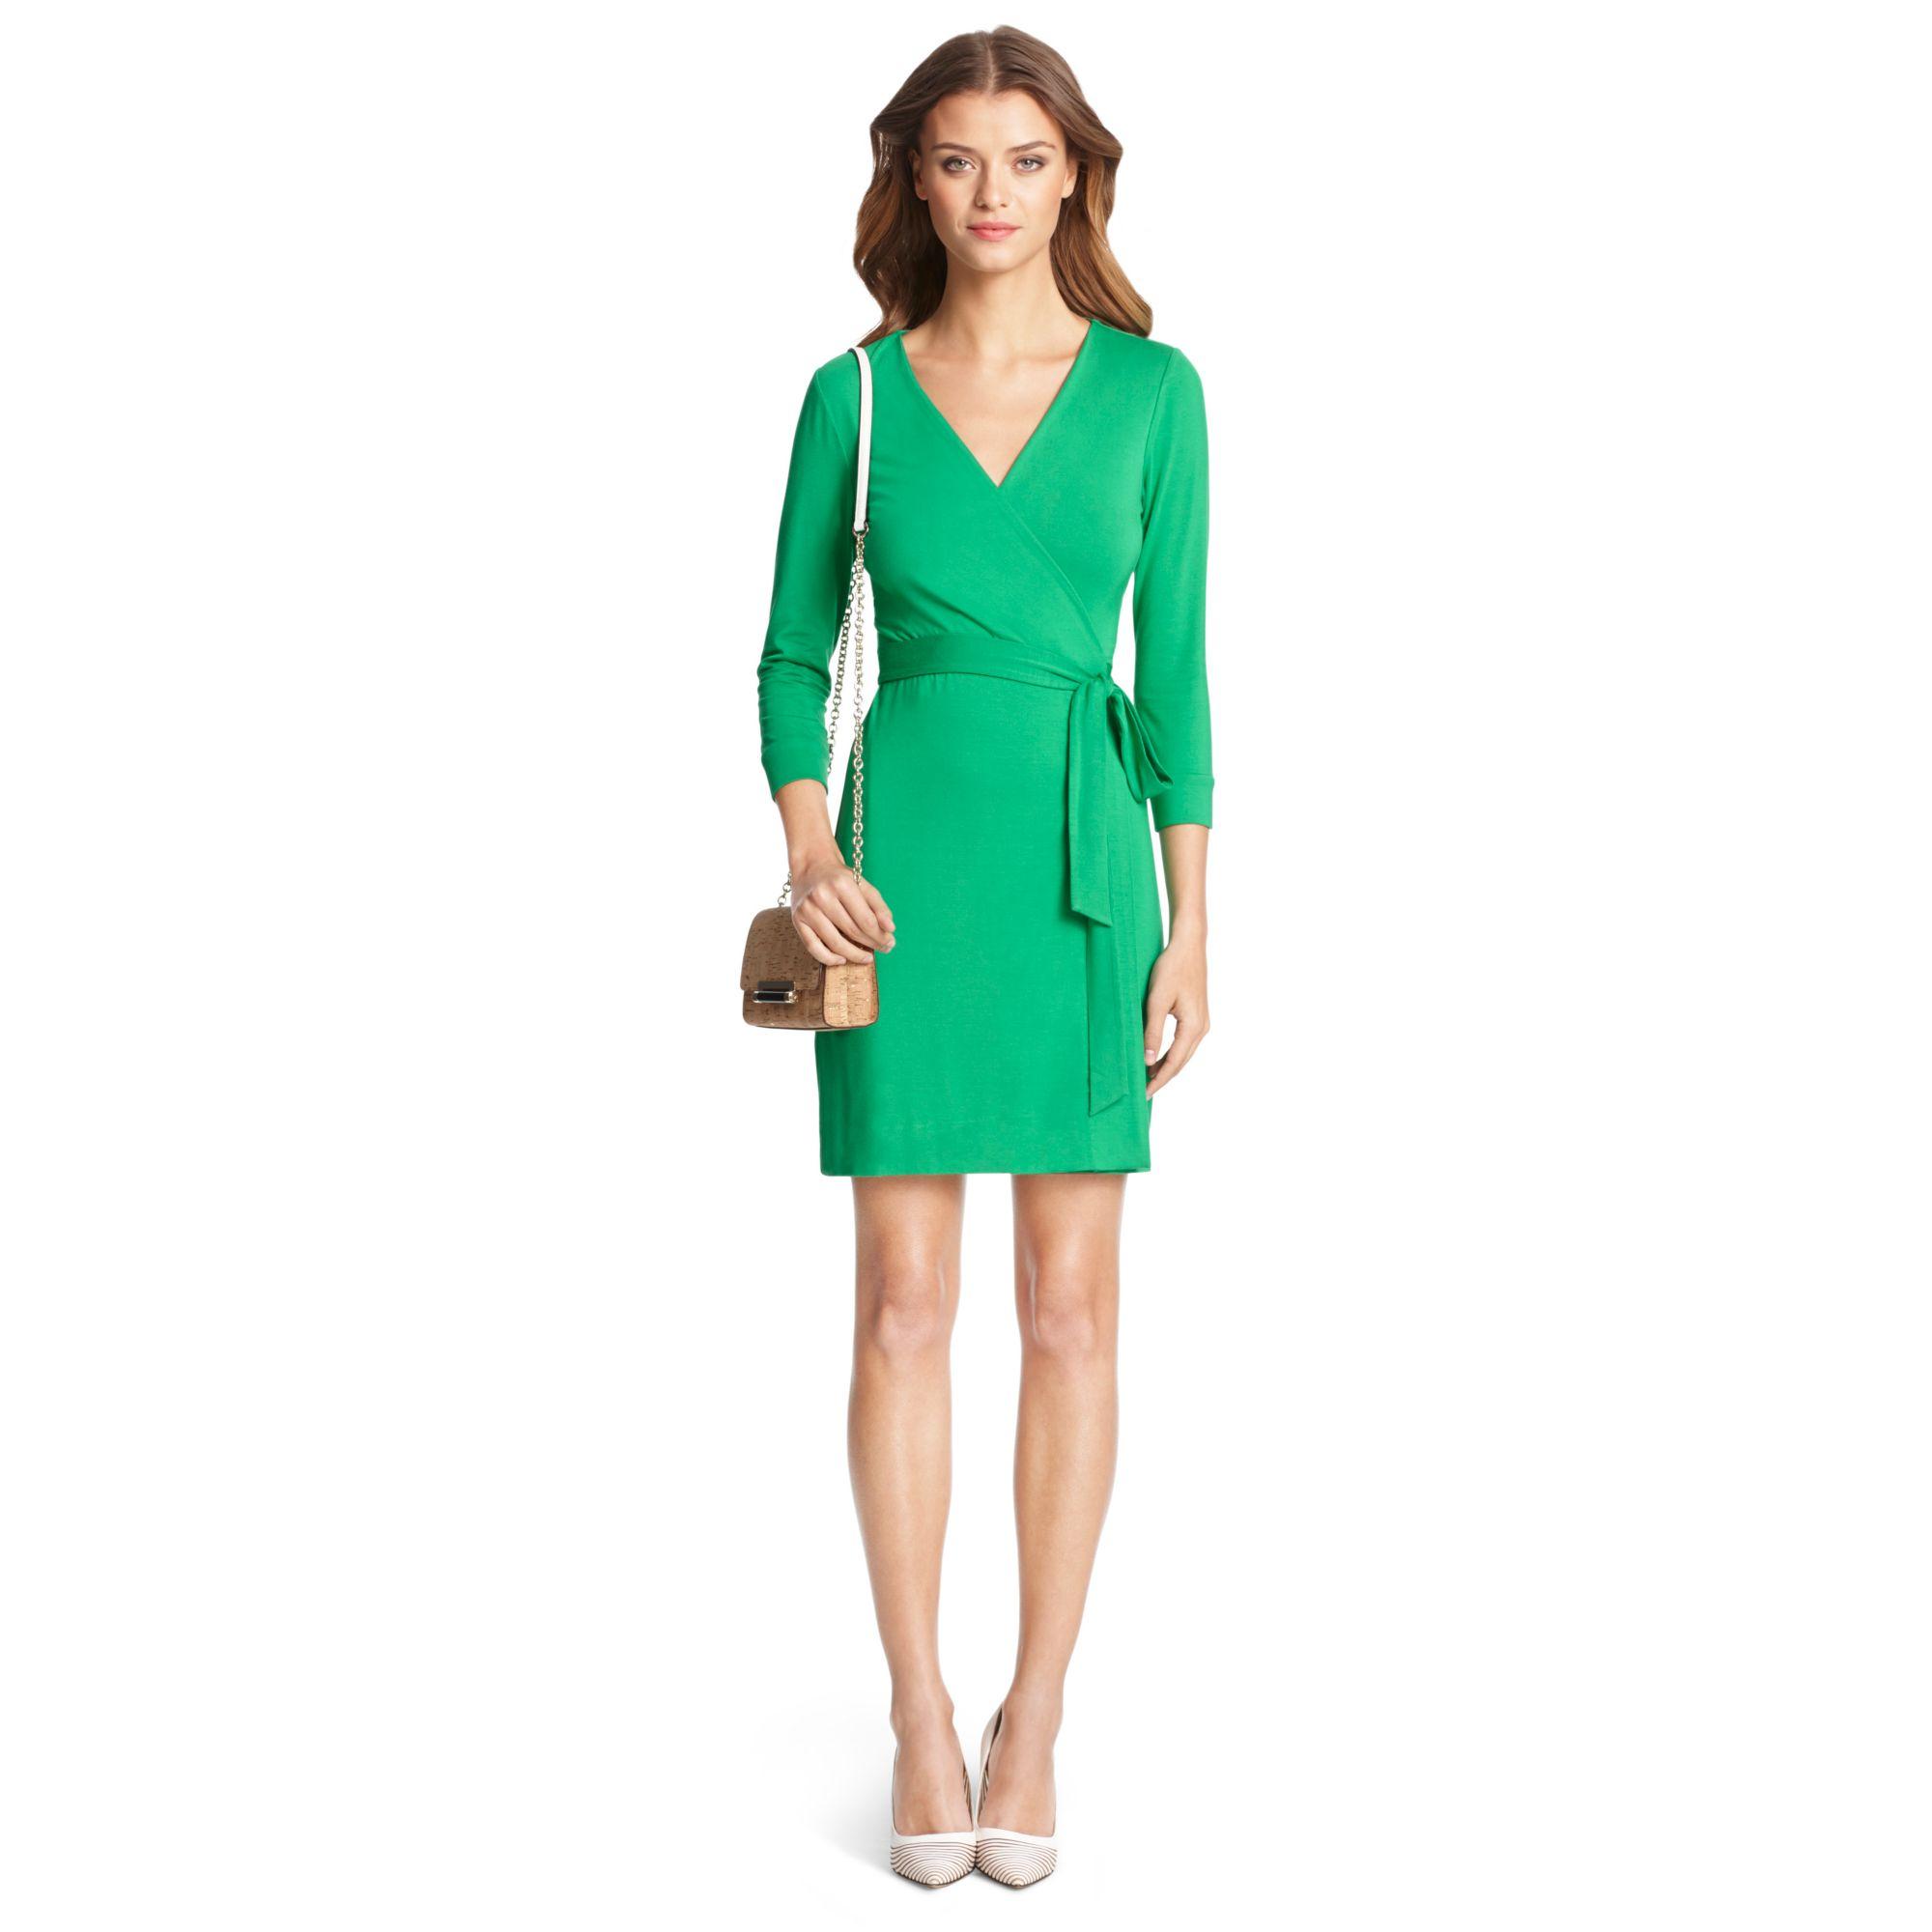 205936b7b3eb Lyst - Diane von Furstenberg New Julian Two Mini Jersey Wrap Dress ...